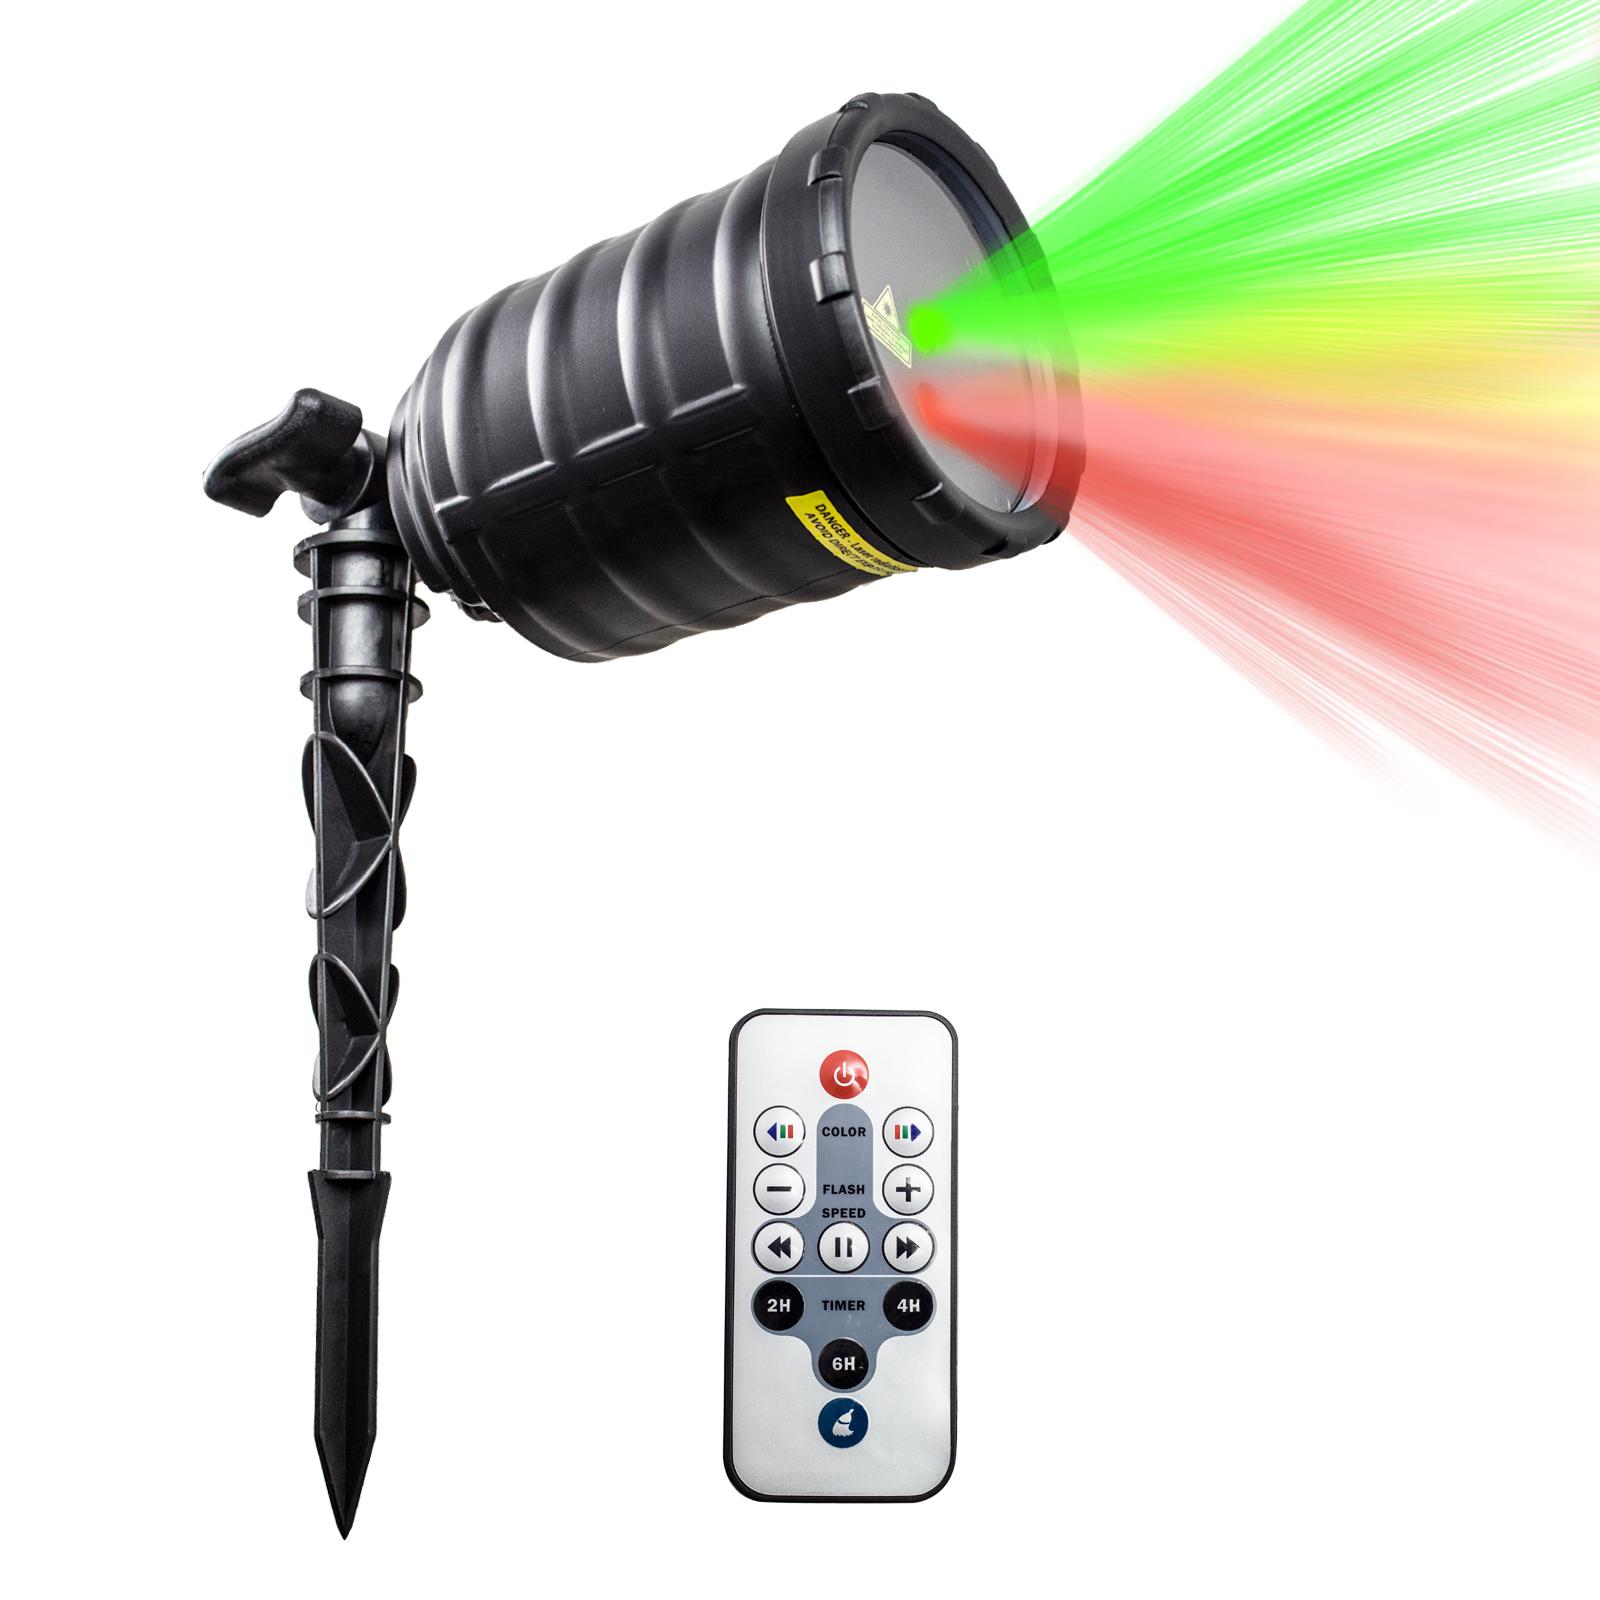 IMAXPLUS Outdoor Laser Light Projector,  Flashing Stage L...